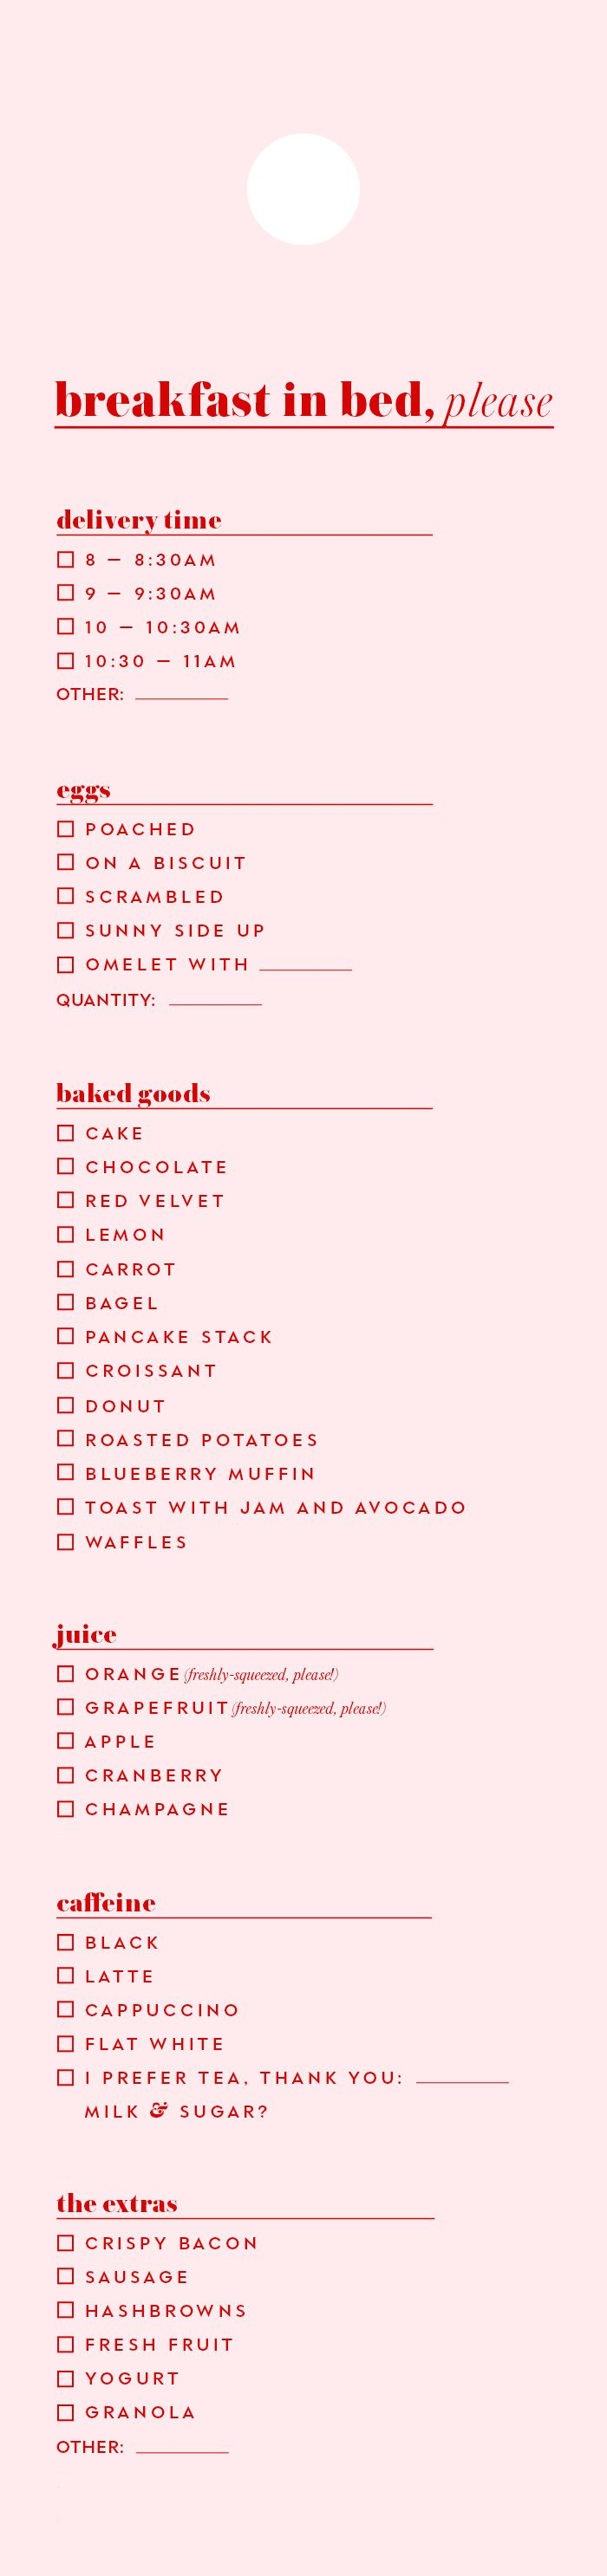 Breakfast In Bed by katespade: Room service, no hotel required. Downloadable menu. #Menu #Breakfast_in_Bed #Free_Download